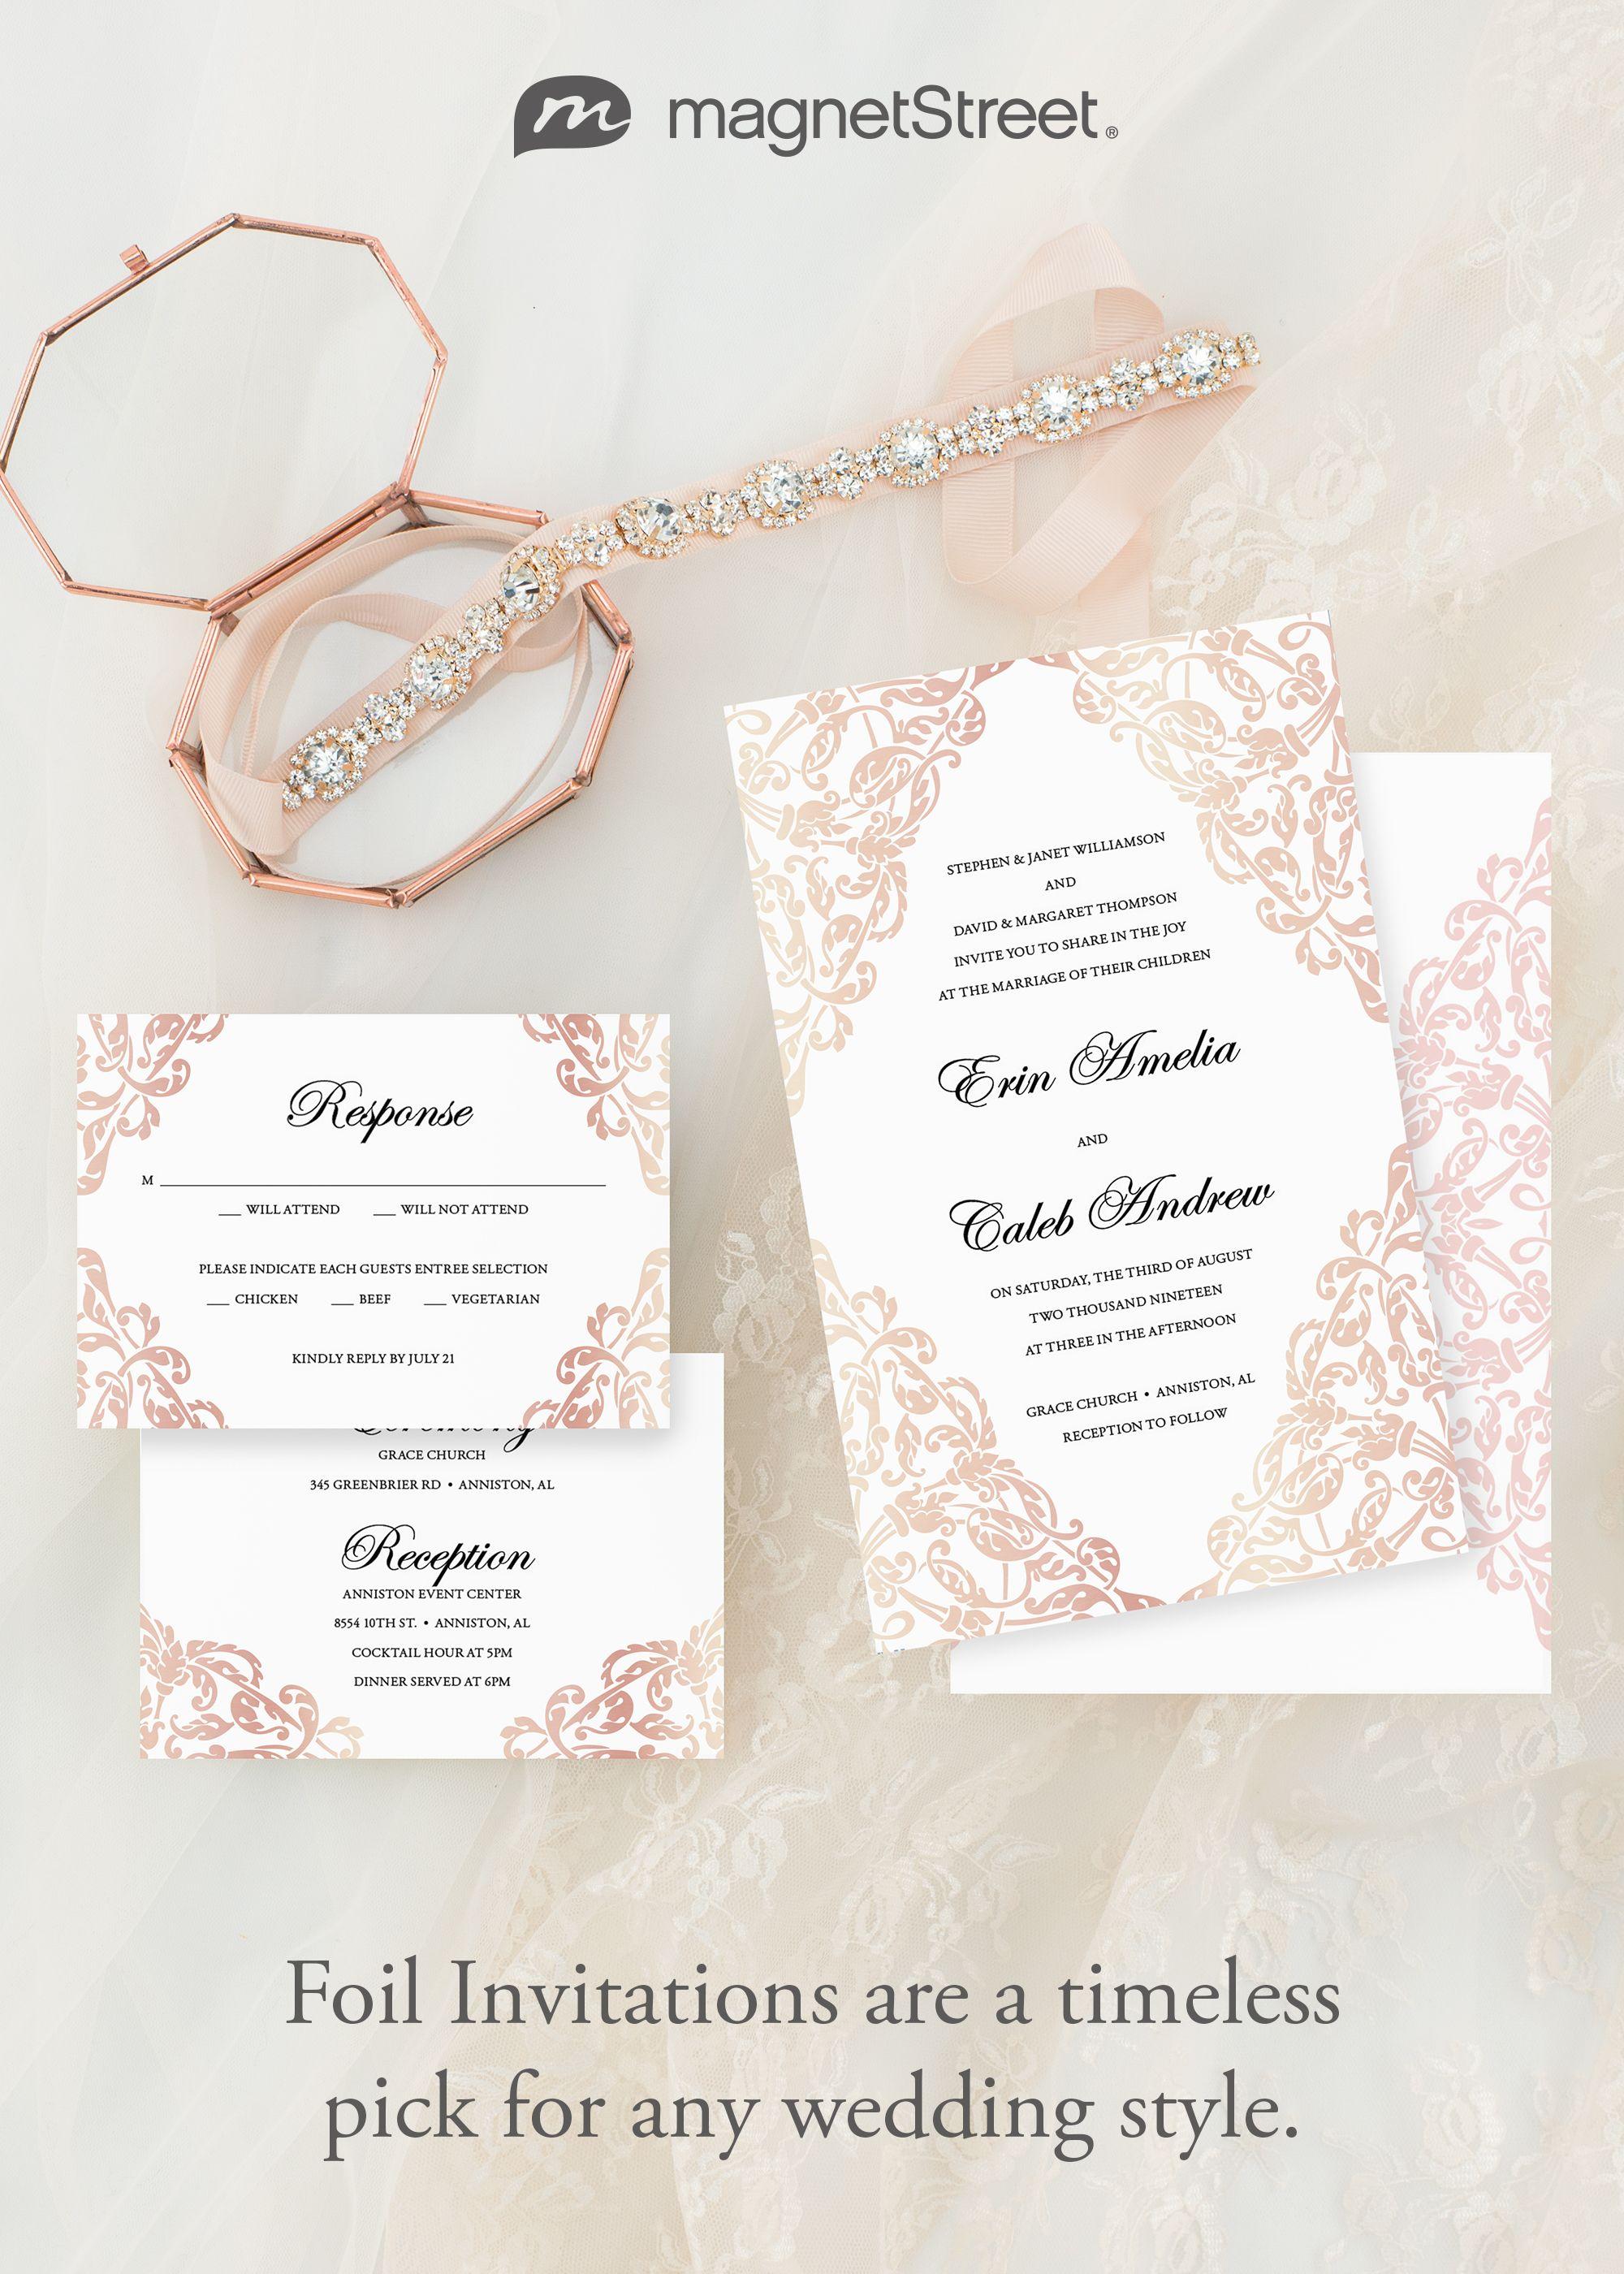 Virtual Wedding Invitation Template Printable Virtual Invite Etsy In 2020 Wedding Invitation Templates Invitation Template Etsy Wedding Invitations